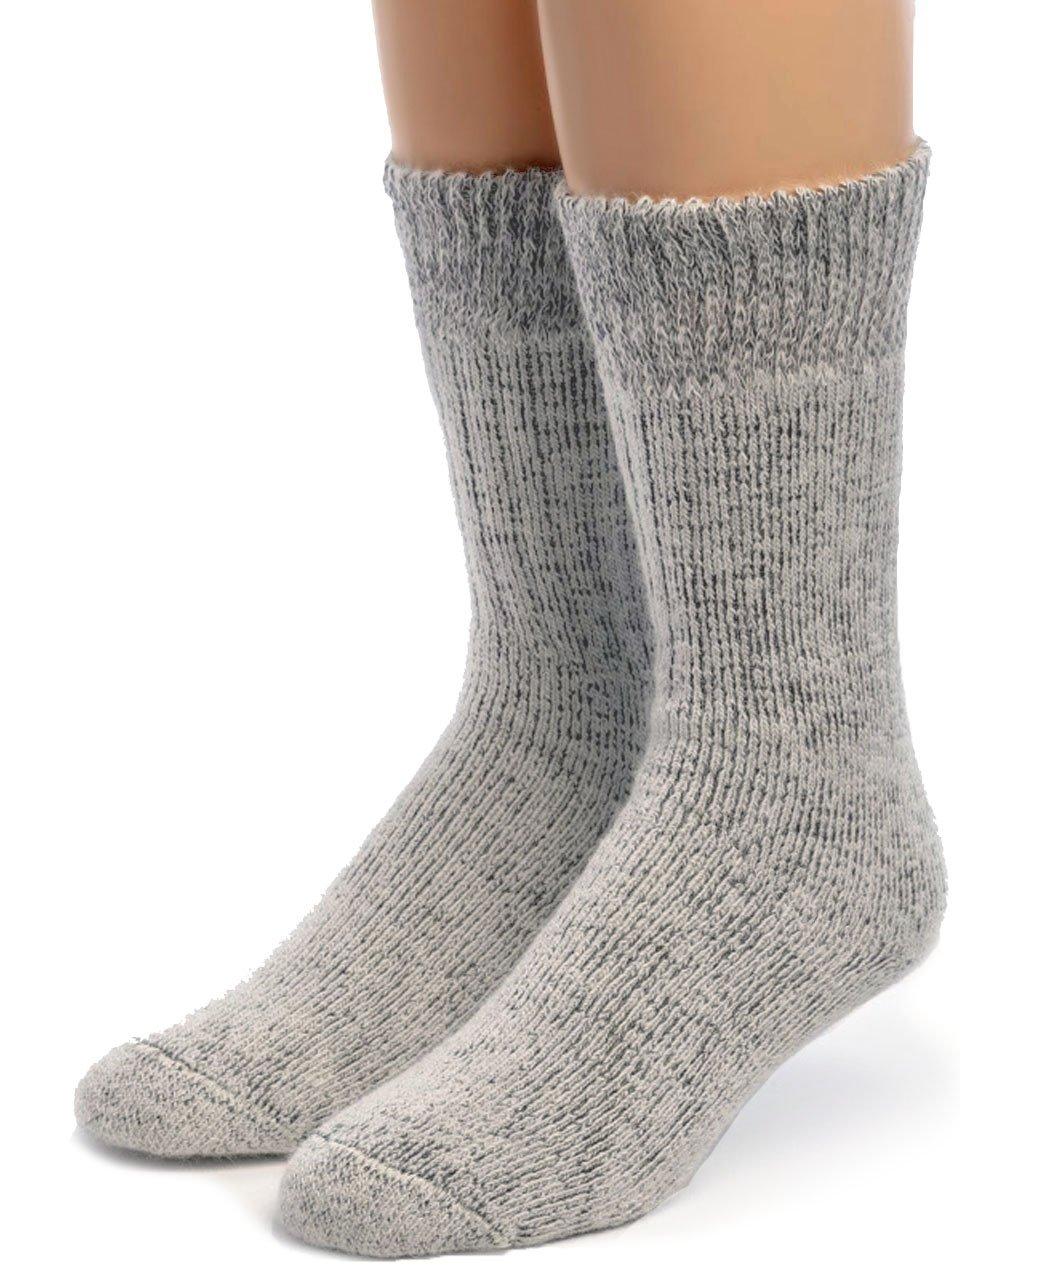 Warrior Alpaca Socks - Boy's Ultimate Alpaca Socks White/Cinder M